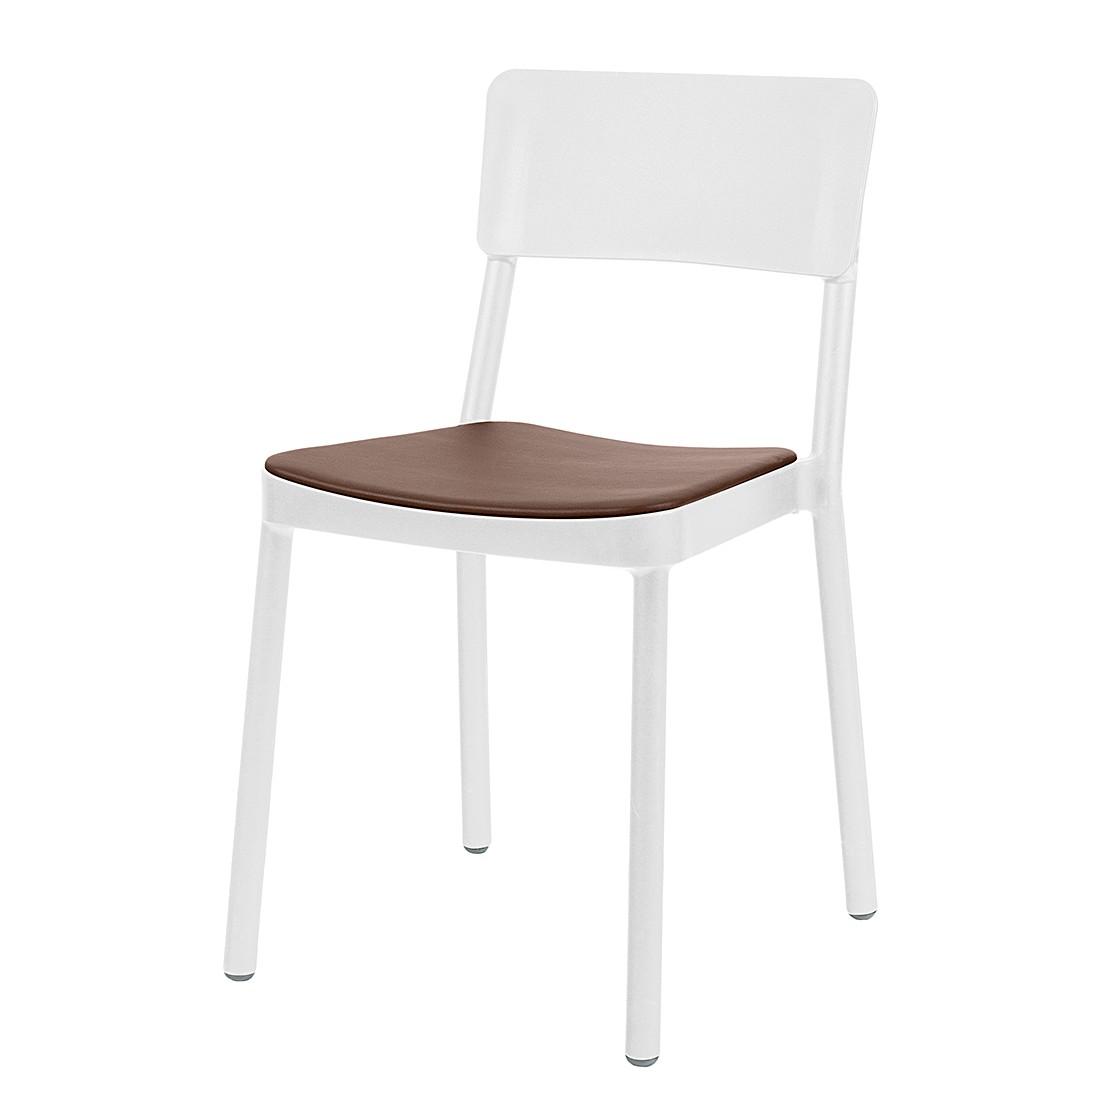 Stuhl wei kunstleder preisvergleich die besten angebote for Kunstleder stuhl braun